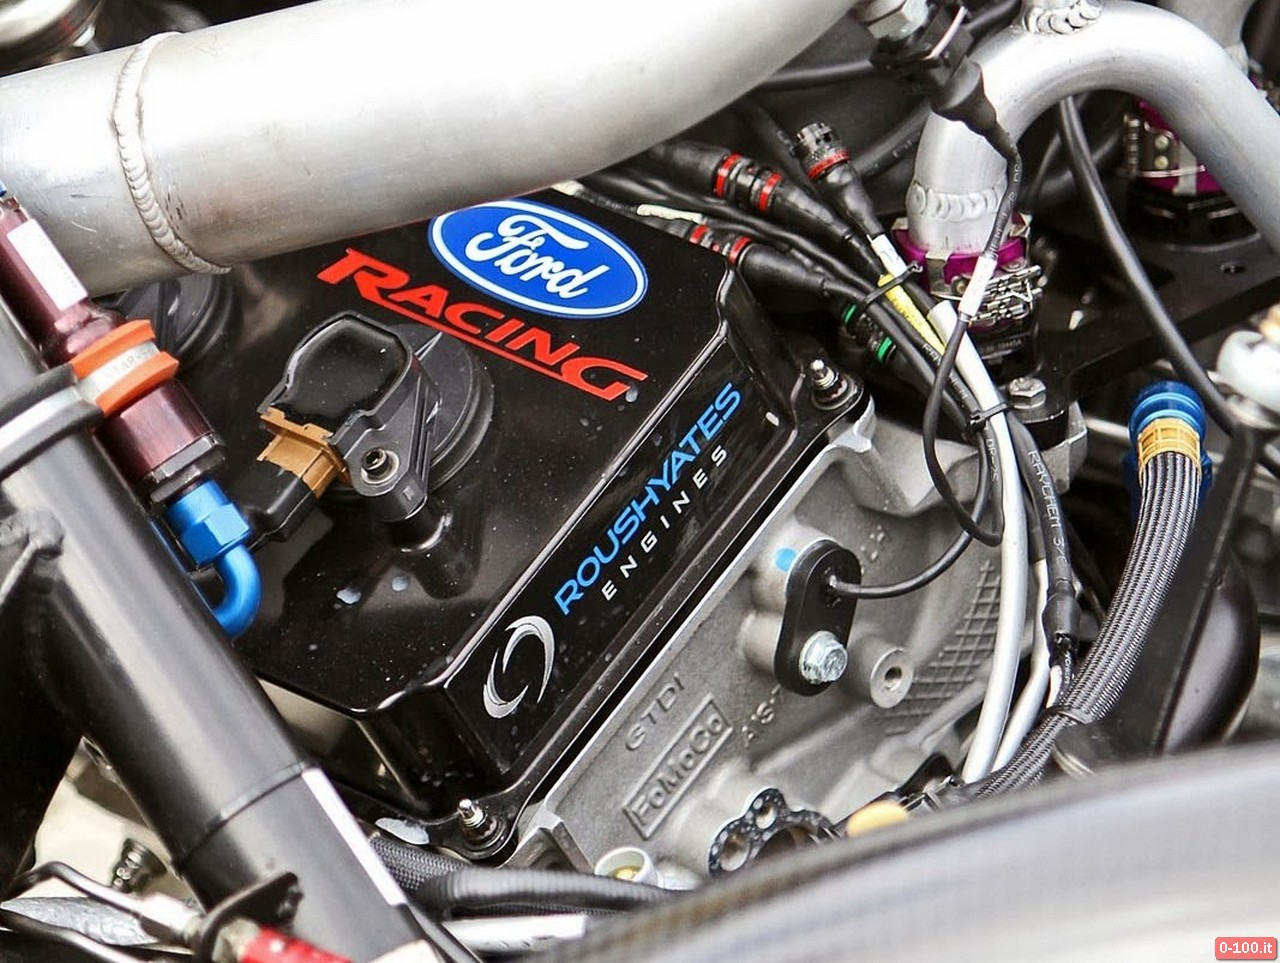 michael-shank-ford-racing-daytona-prototipe-v6-ecoboost-daytona-colin-braun_0-100_3